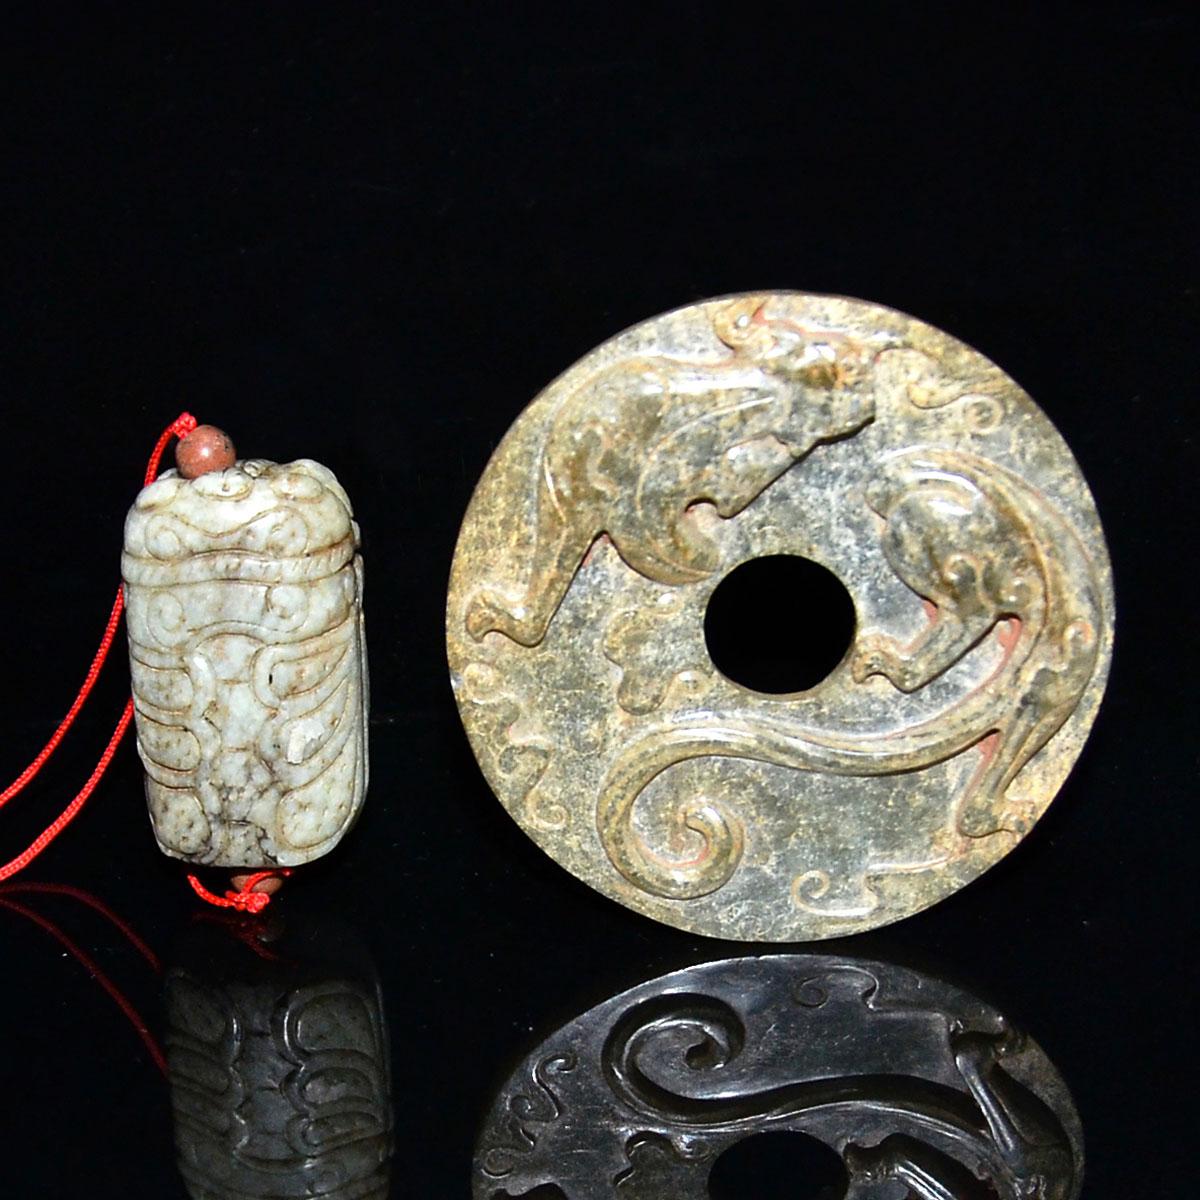 Lot 34 - 古玉掛飾兩件:螭龍璧,玉蟬 Two Archaistic Jade Pendants Carvings: Qilin Bi and Cicada. Diameter: 2⅝ in (6.7 cm)